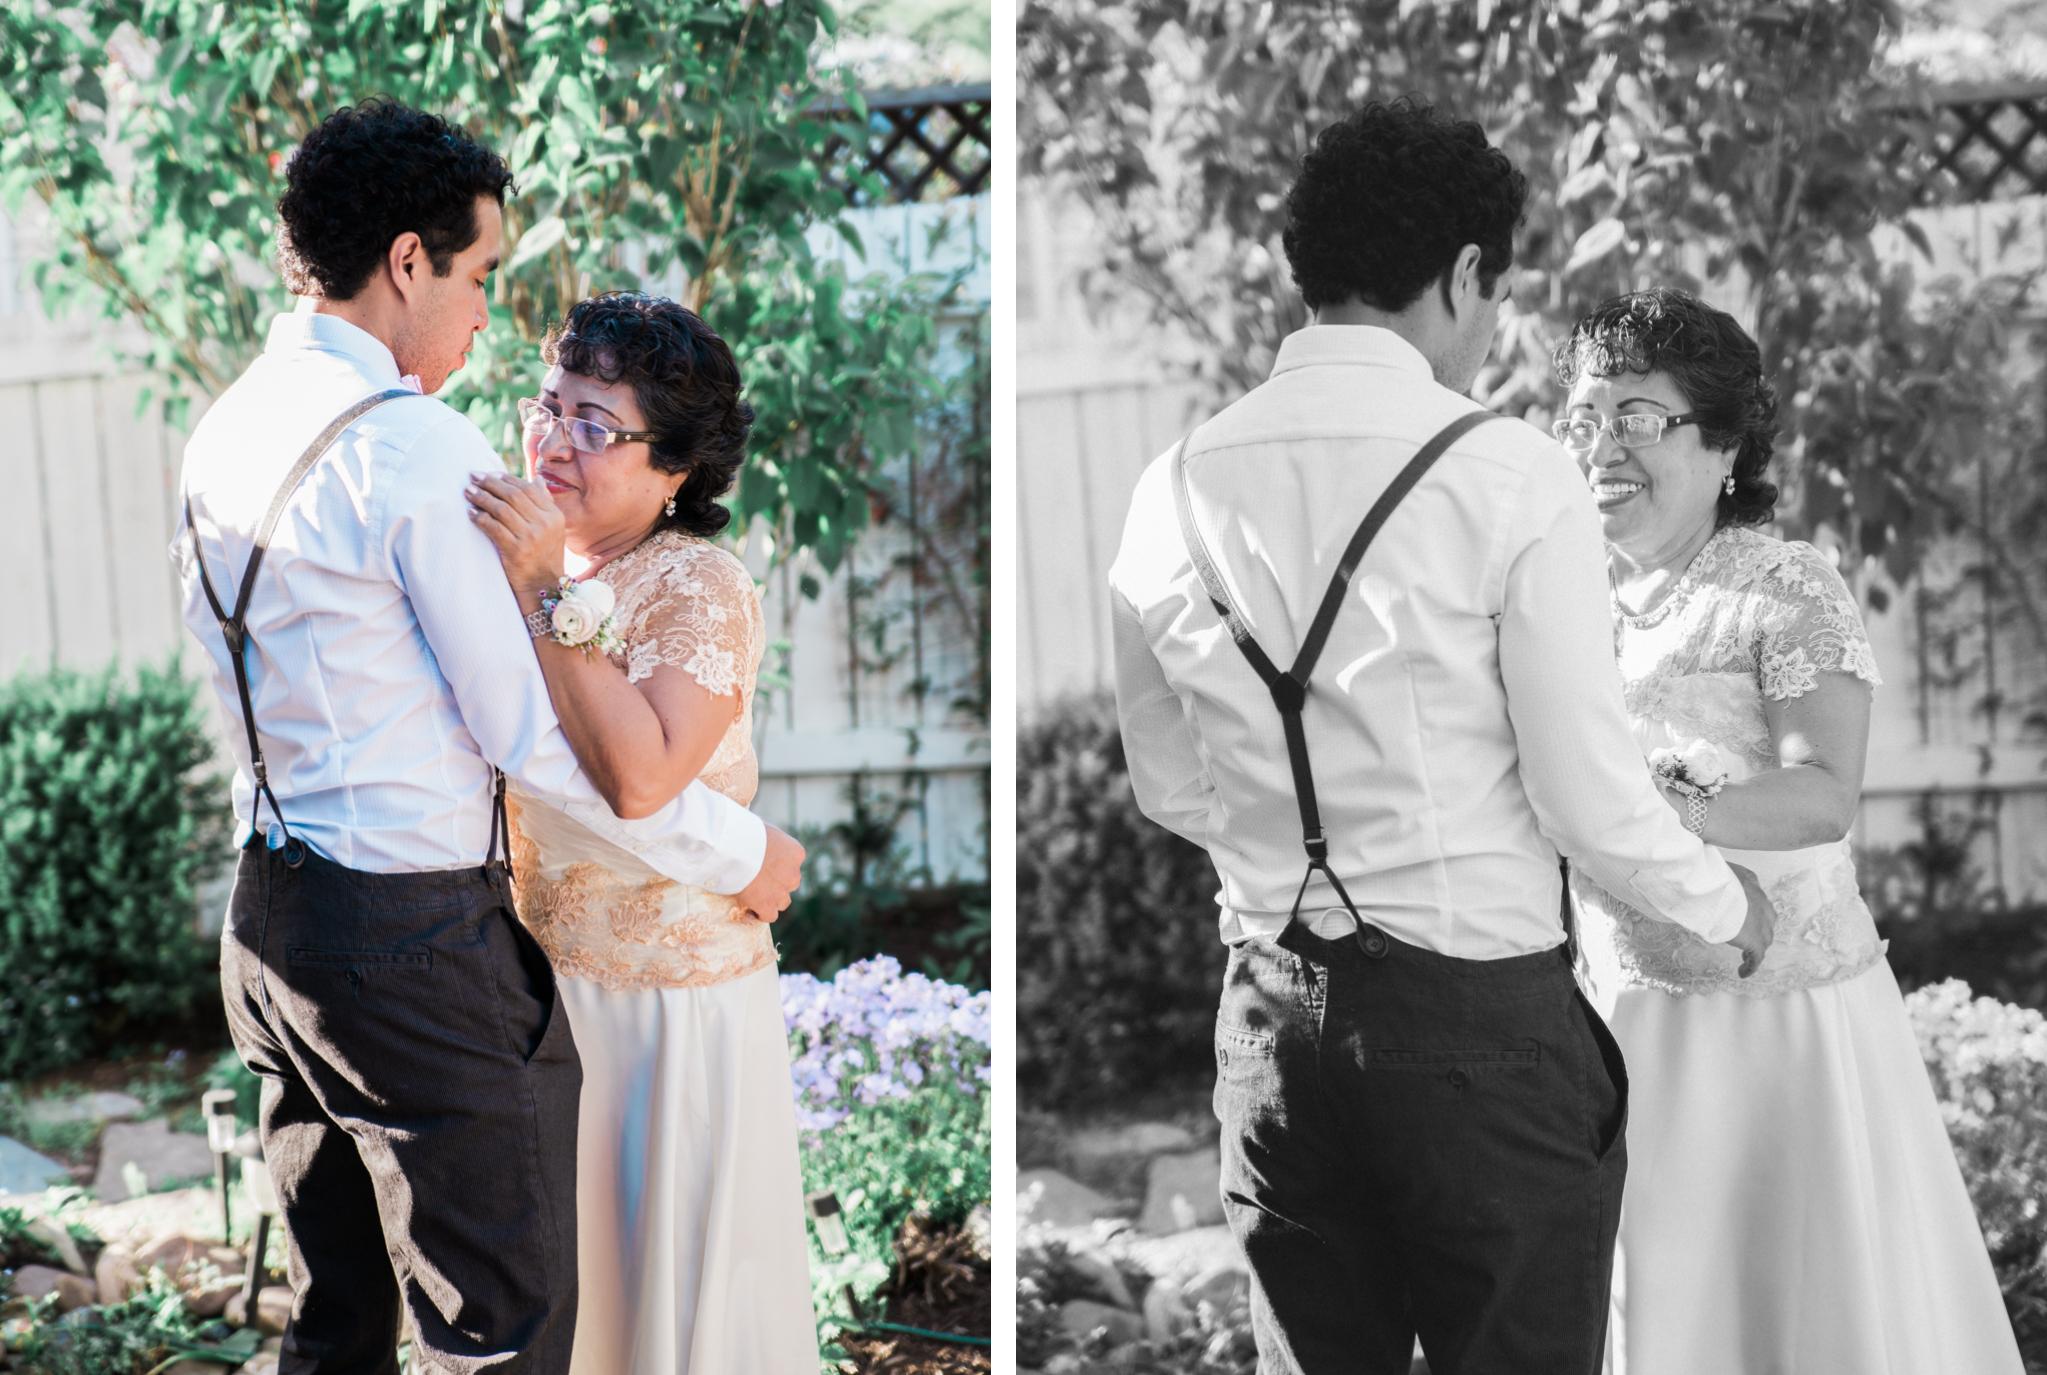 Altoona wedding photographer_Julie Israel (70).jpg